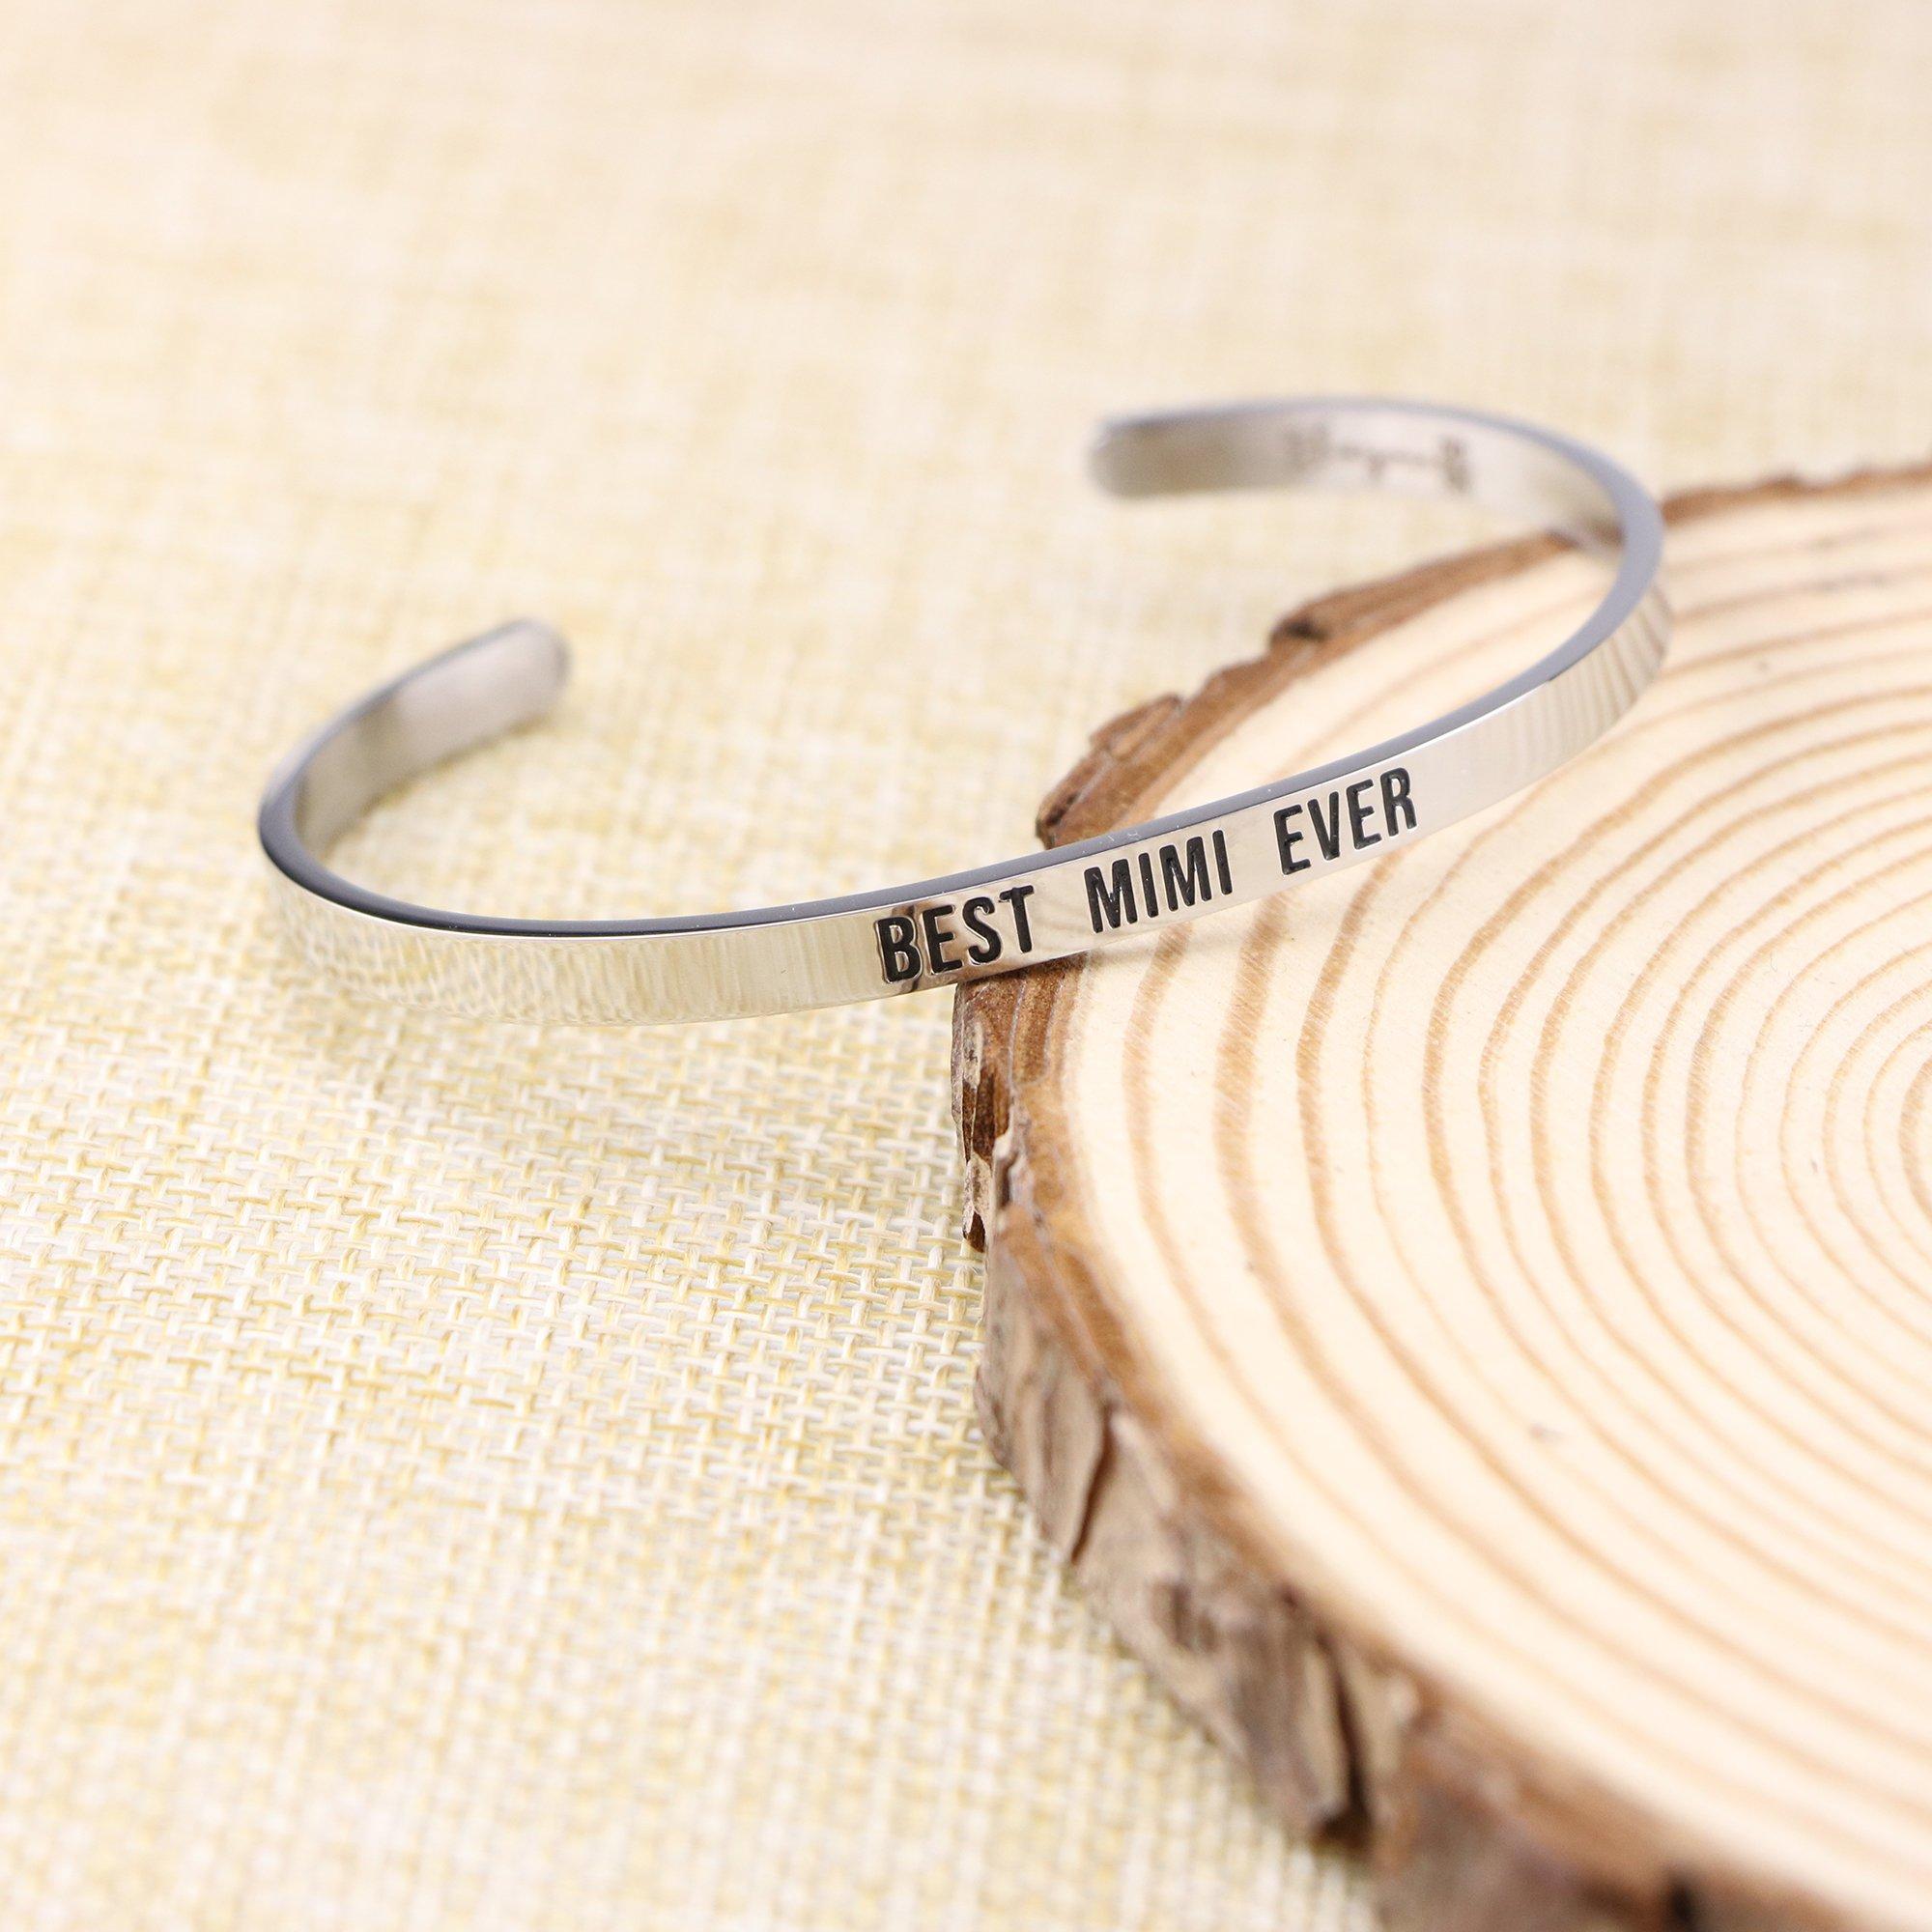 Joycuff Best Mimi Ever Bracelet Jewelry Gifts for Grandma Mantra Cuff Bracelets Bangle by Joycuff (Image #2)